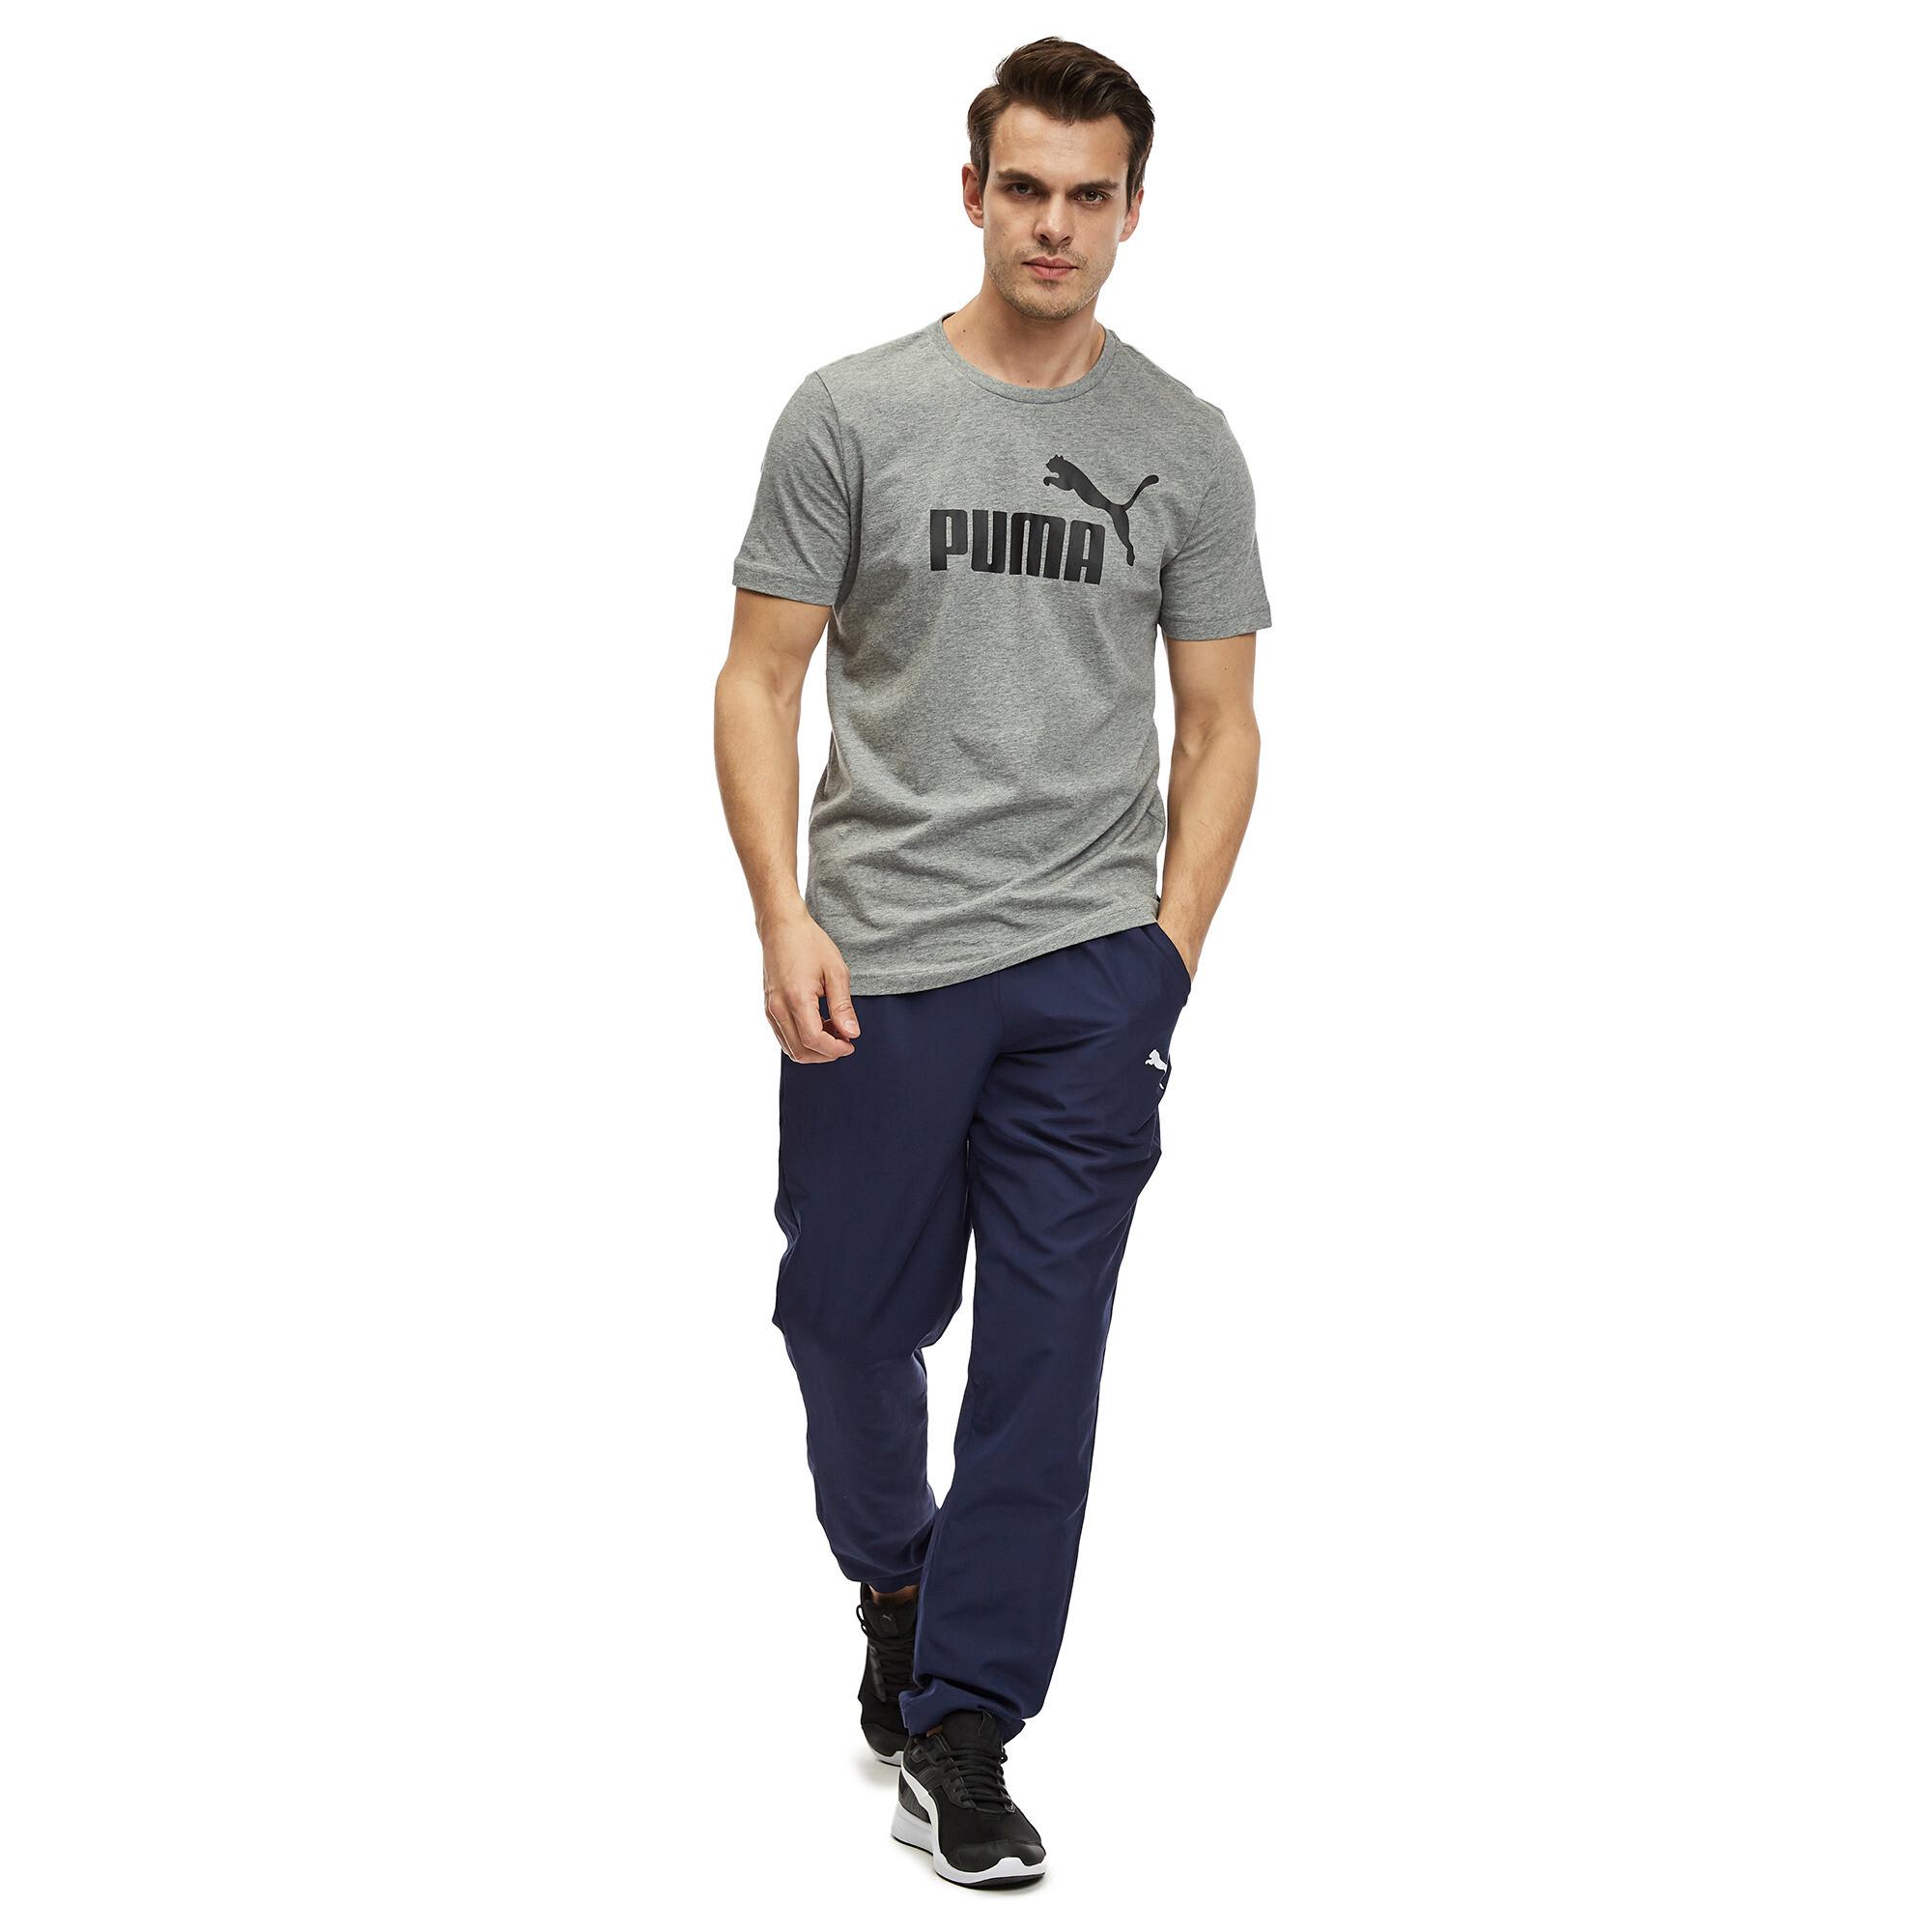 Image Puma Essentials Short Sleeve Men's Tee #3